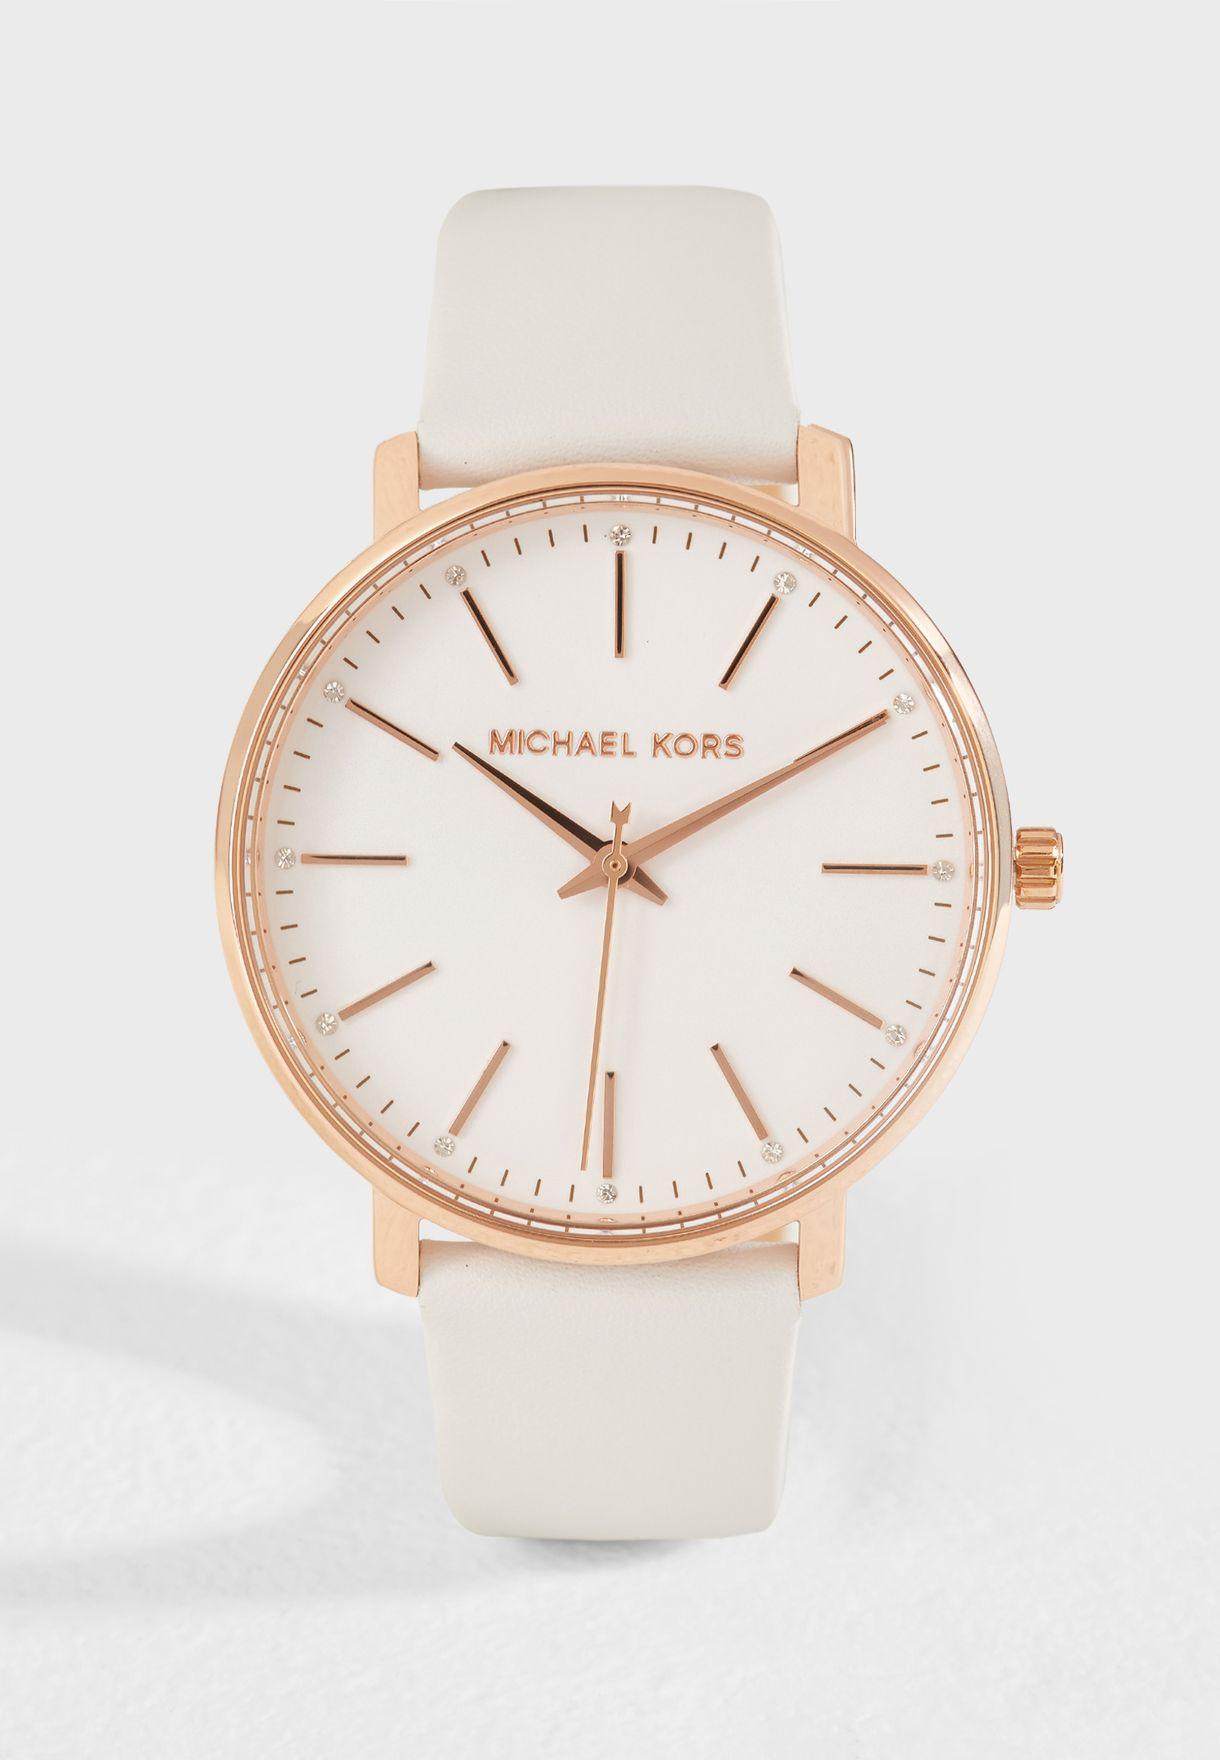 a548a820f تسوق ساعة كلاسيكية بحزام جلد اصلي MK2800 ماركة مايكل كورس لون أبيض ...